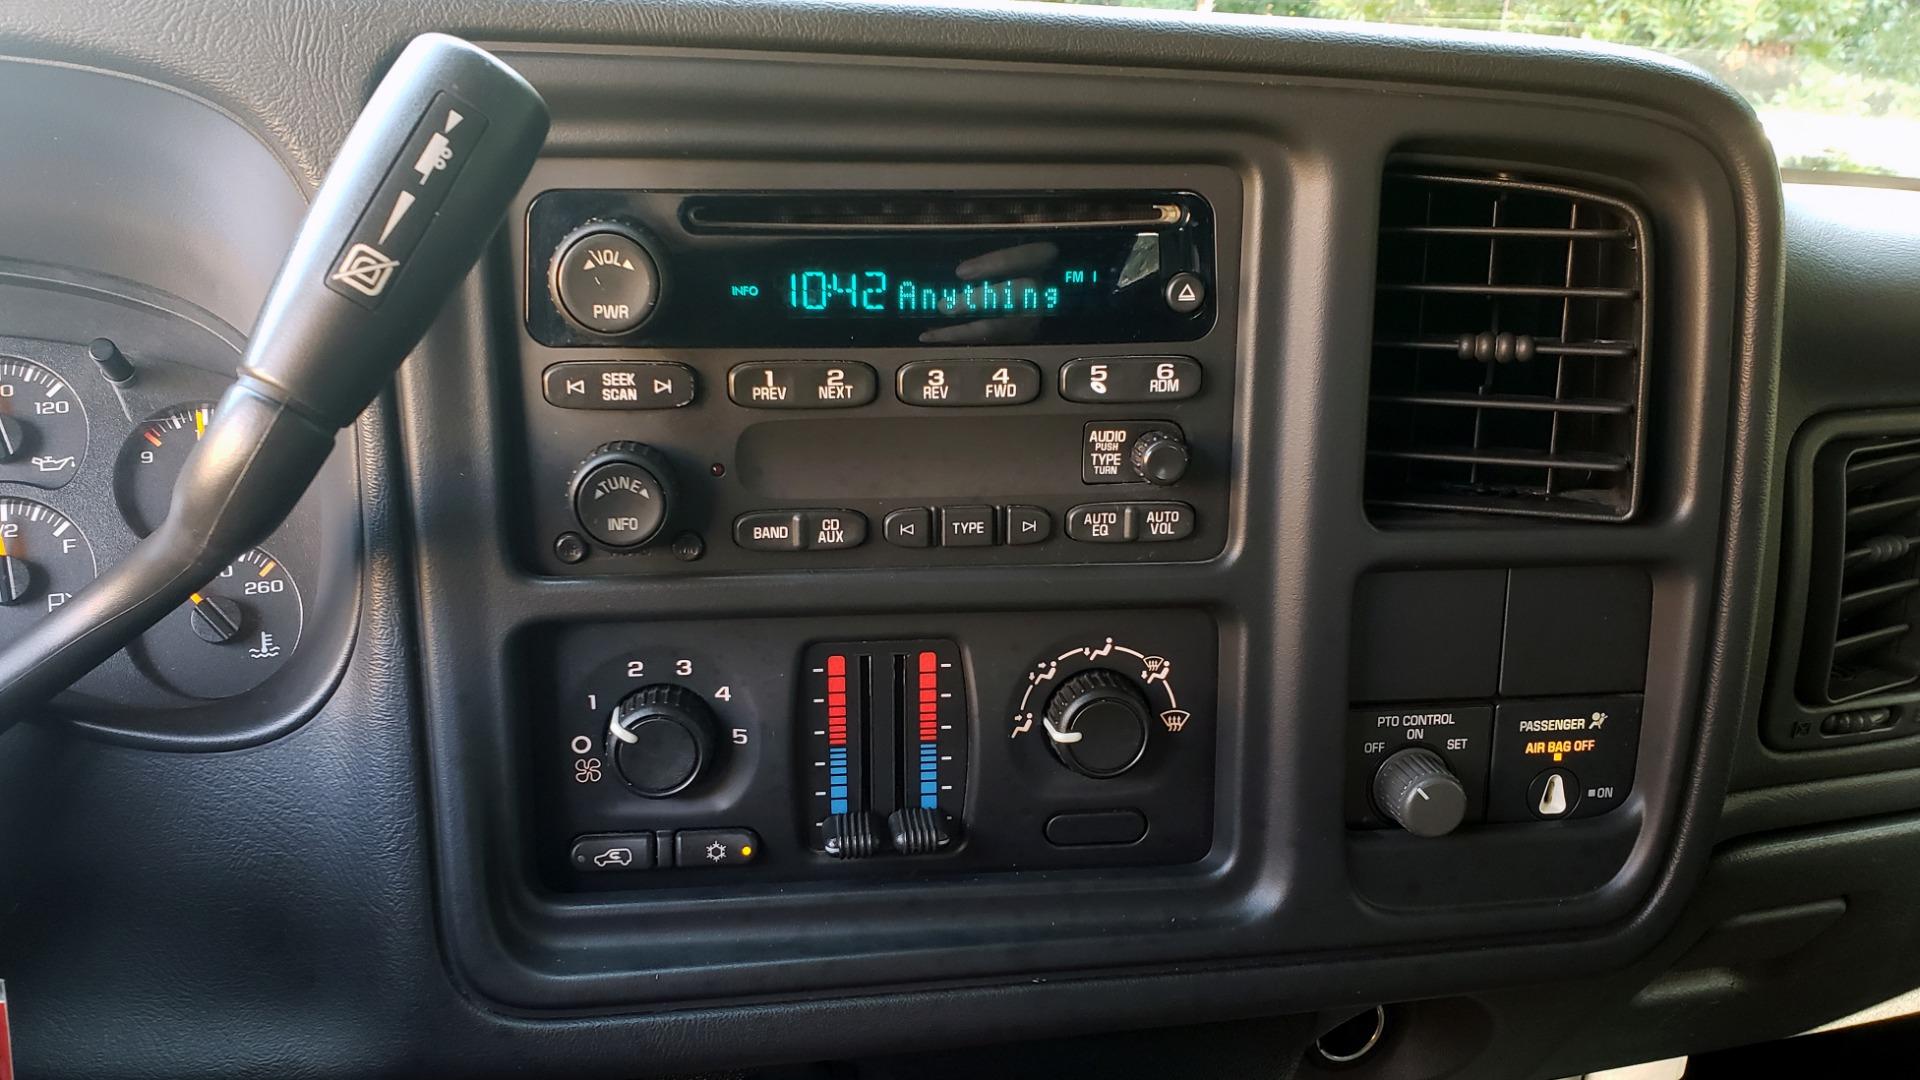 Used 2005 Chevrolet SILVERADO 3500 DRW / 4WD / REG CAB / 6.6L DURAMAX / DOOMSDAY PREPPER for sale $21,499 at Formula Imports in Charlotte NC 28227 18